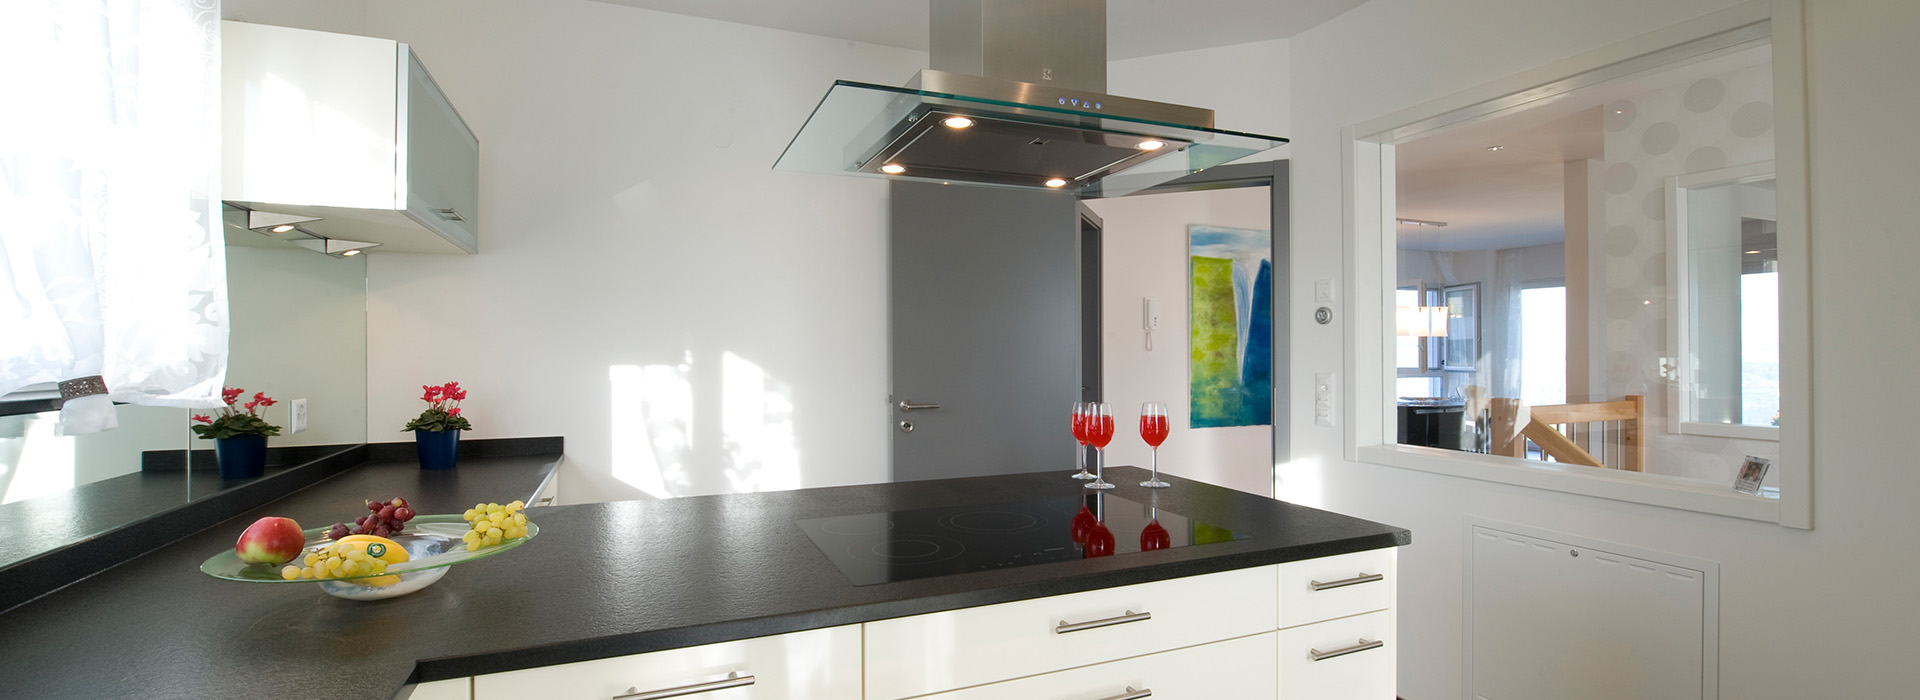 immobilien immobilien kaufen immobilien verkaufen haus verkaufen bauland kaufen bauland. Black Bedroom Furniture Sets. Home Design Ideas